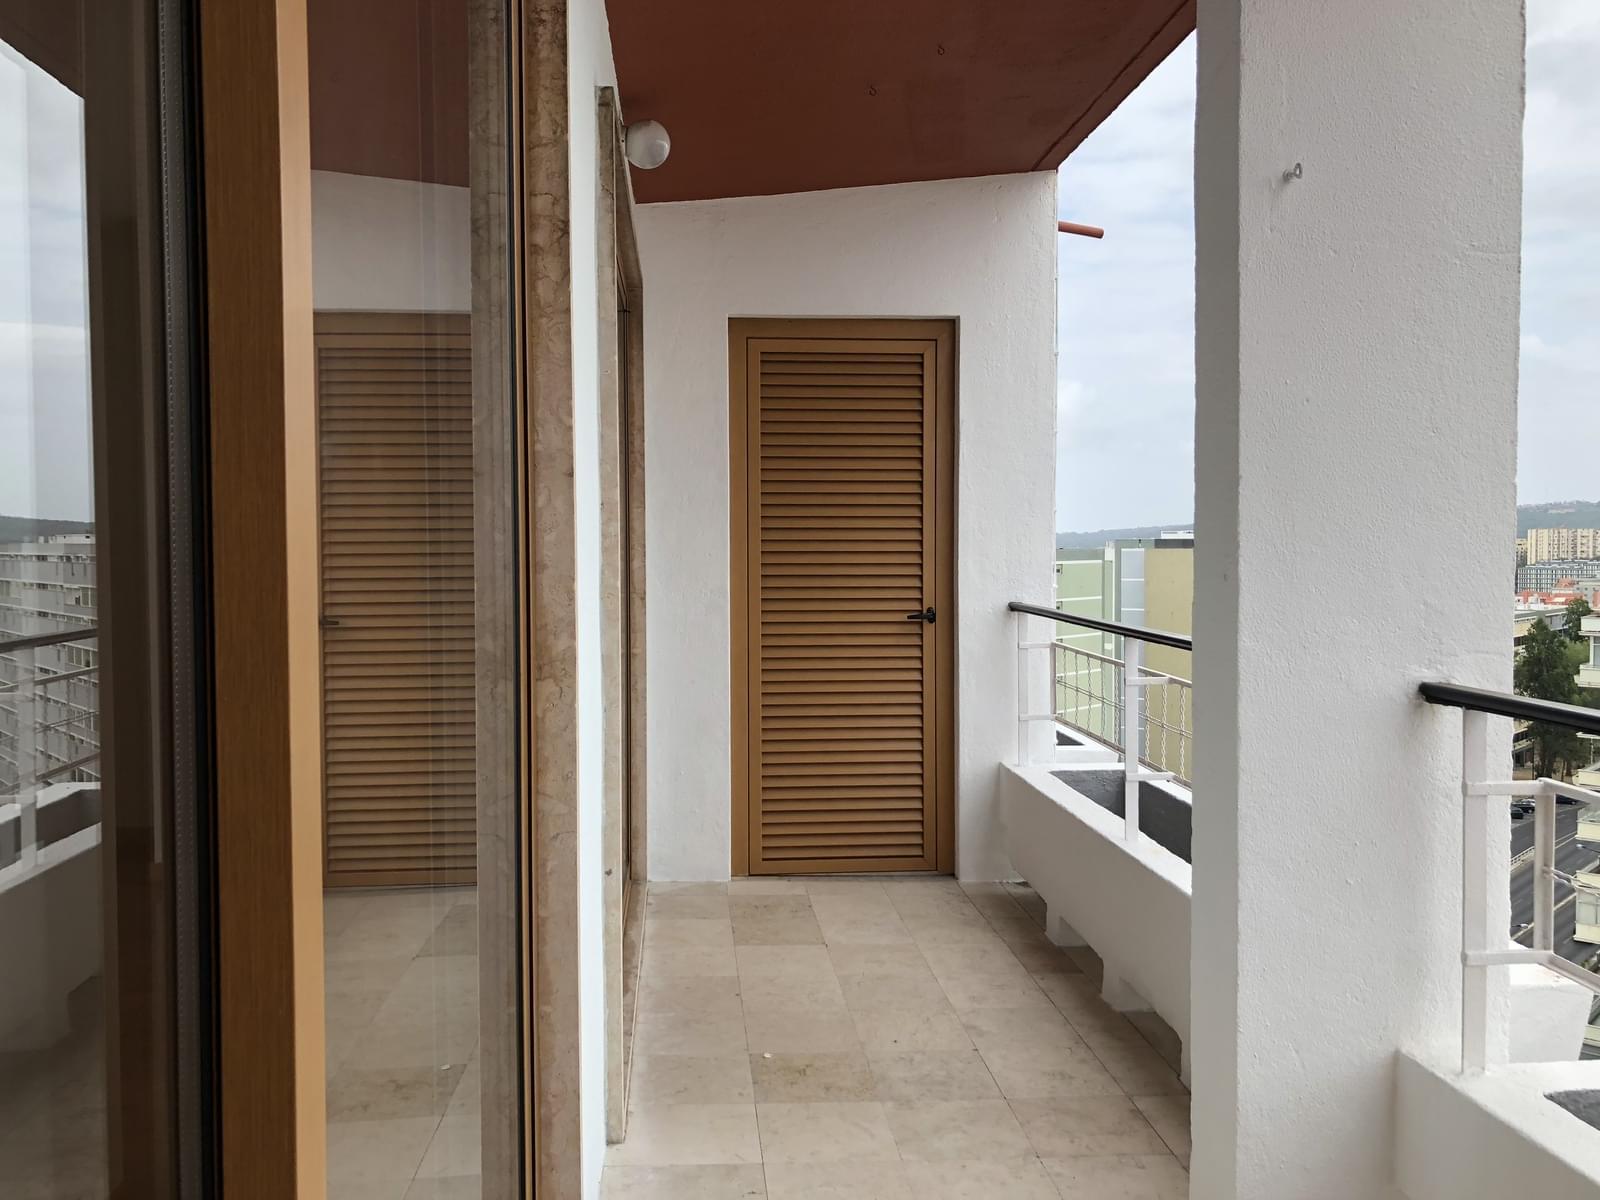 pf18040-apartamento-t3-lisboa-ee3f3dcf-4588-47bd-8573-faf16f39af60